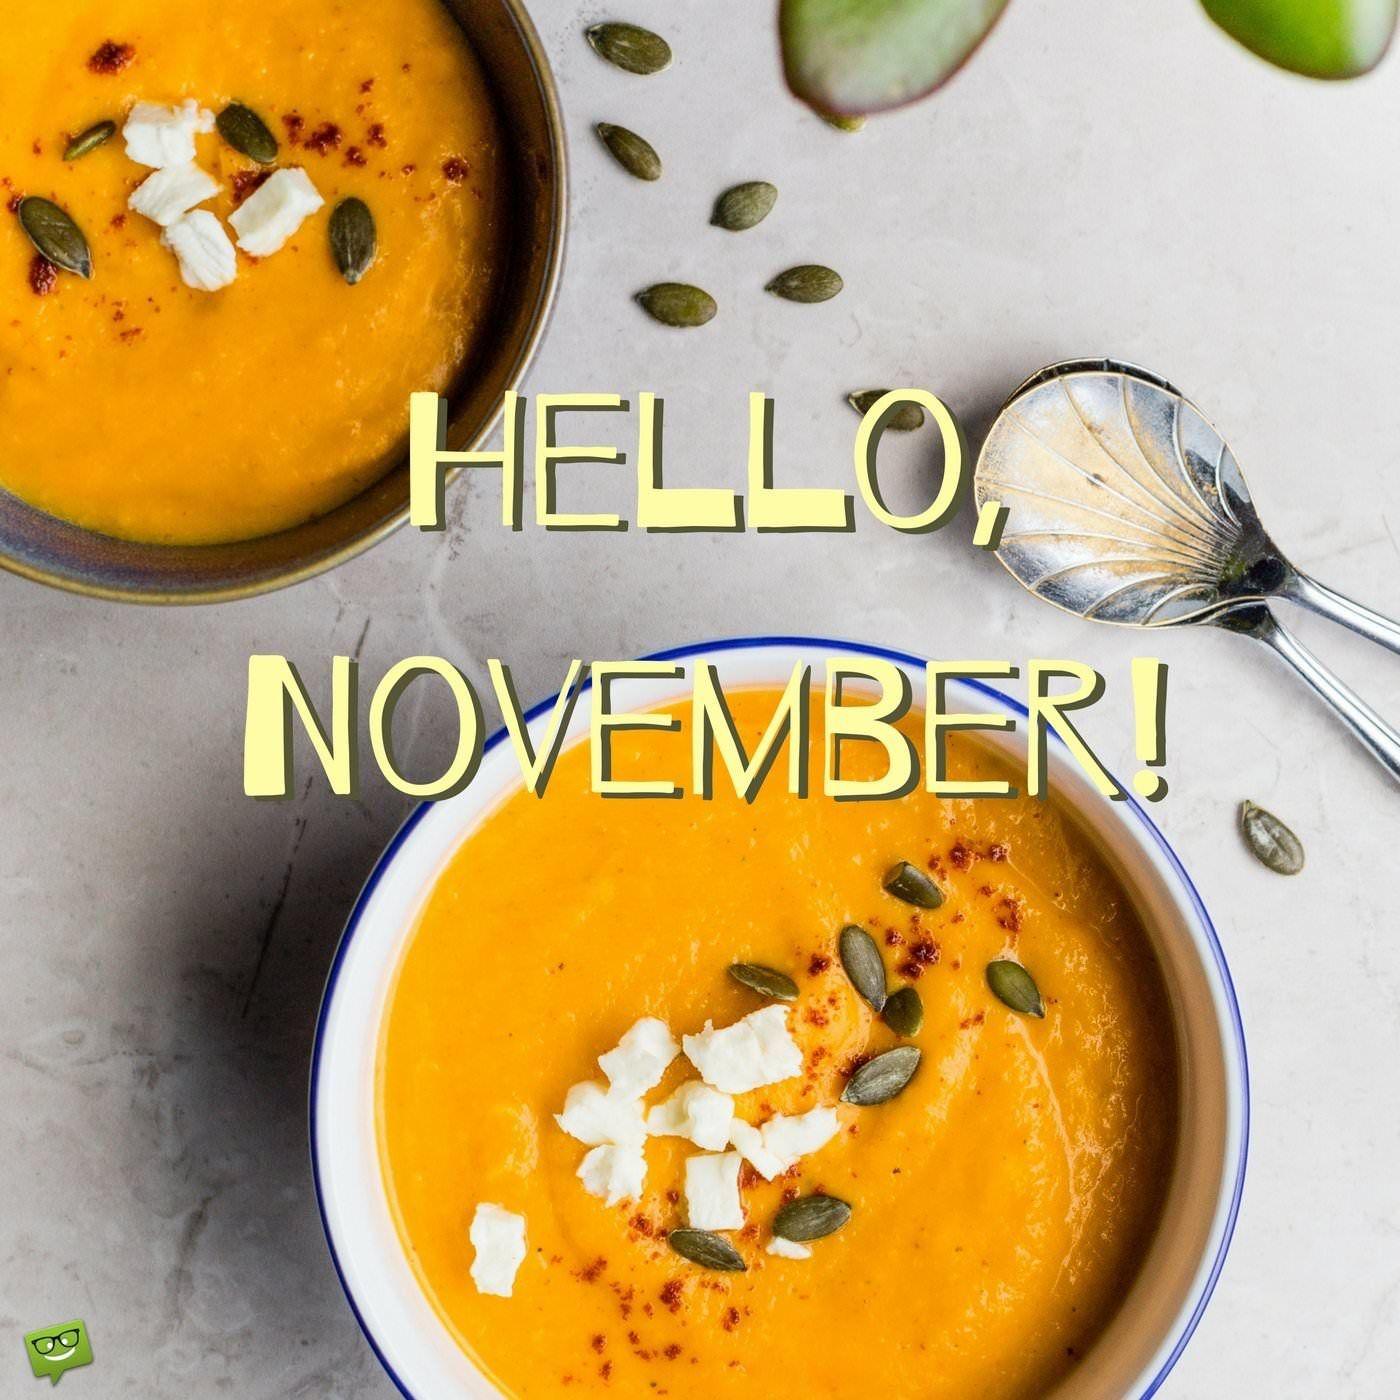 Hello November Hello november, November, november